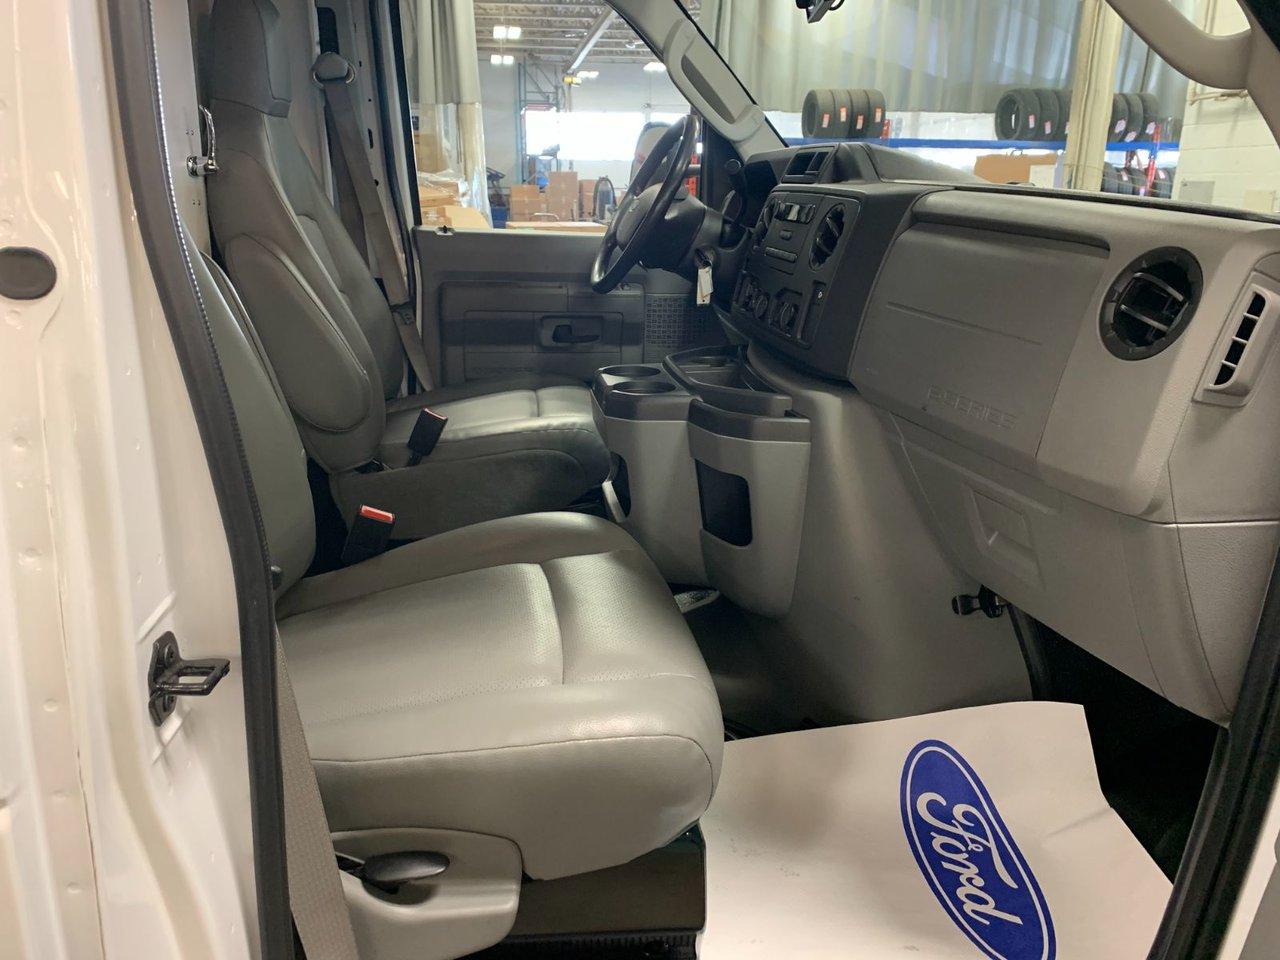 2019 Ford E-Series Cutaway CUBE 16 PIEDS AVEC RAMPE